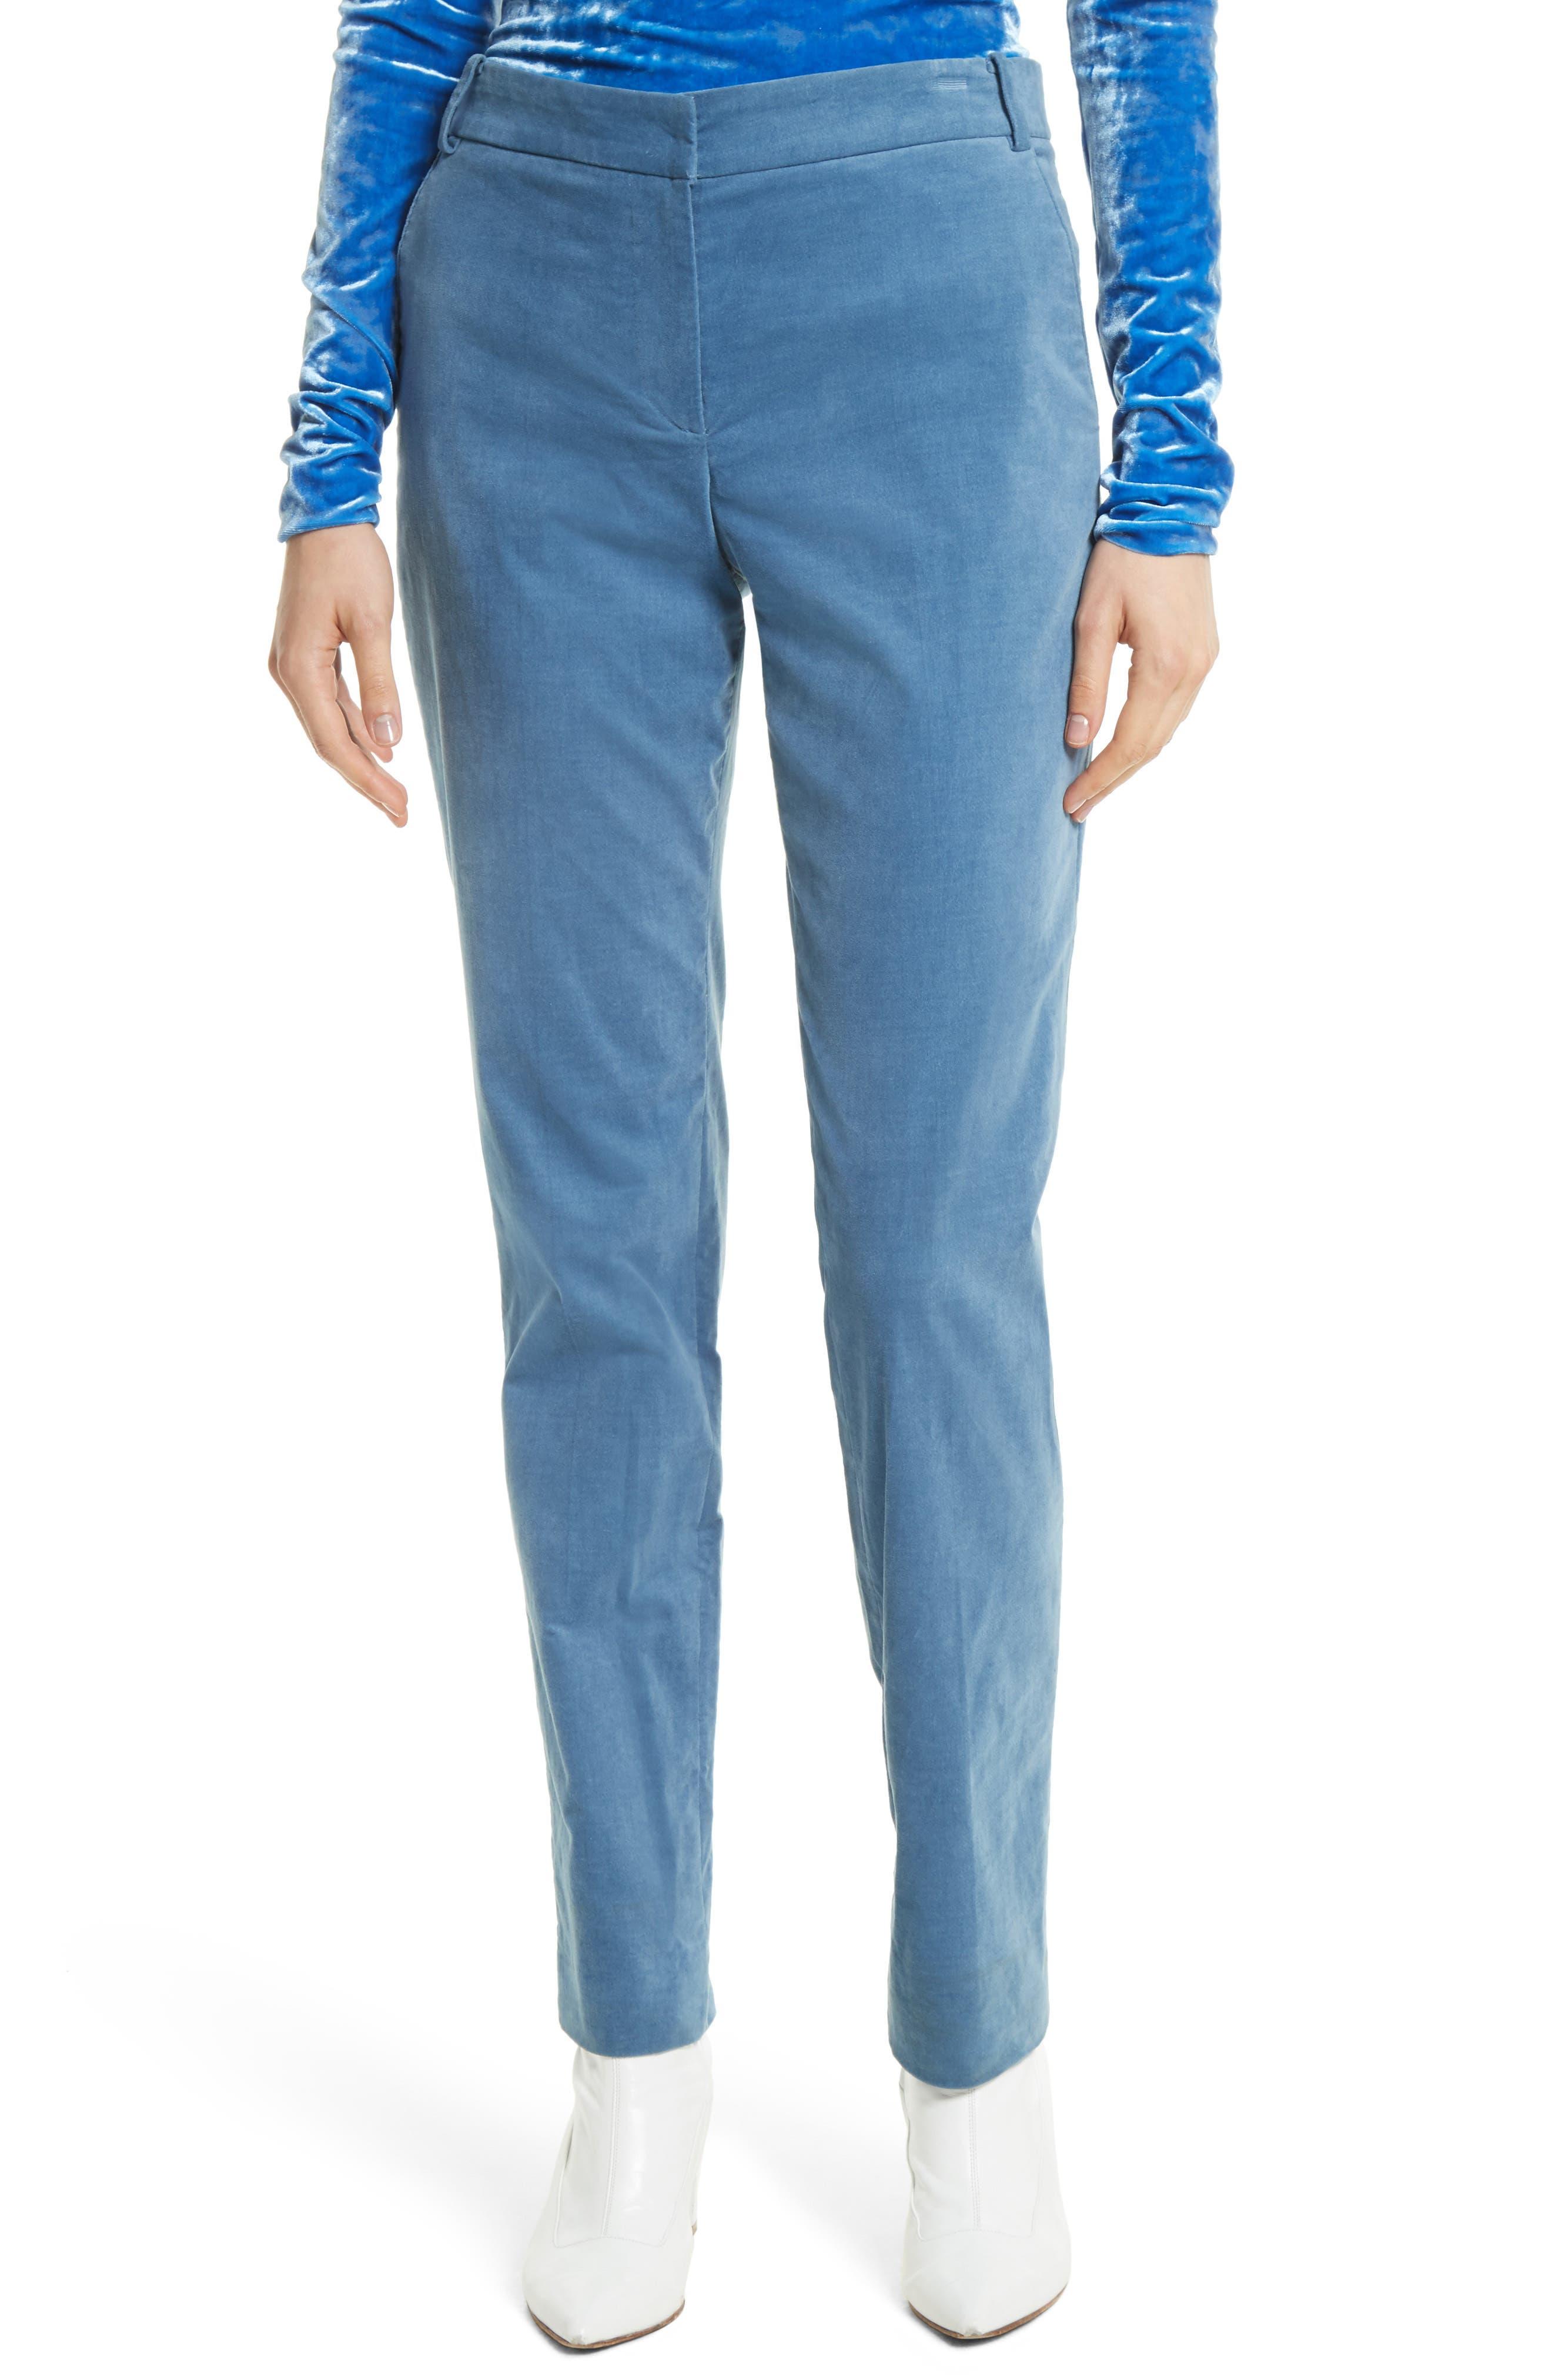 Moleskin Stretch Cotton Skinny Pants,                         Main,                         color, Blue